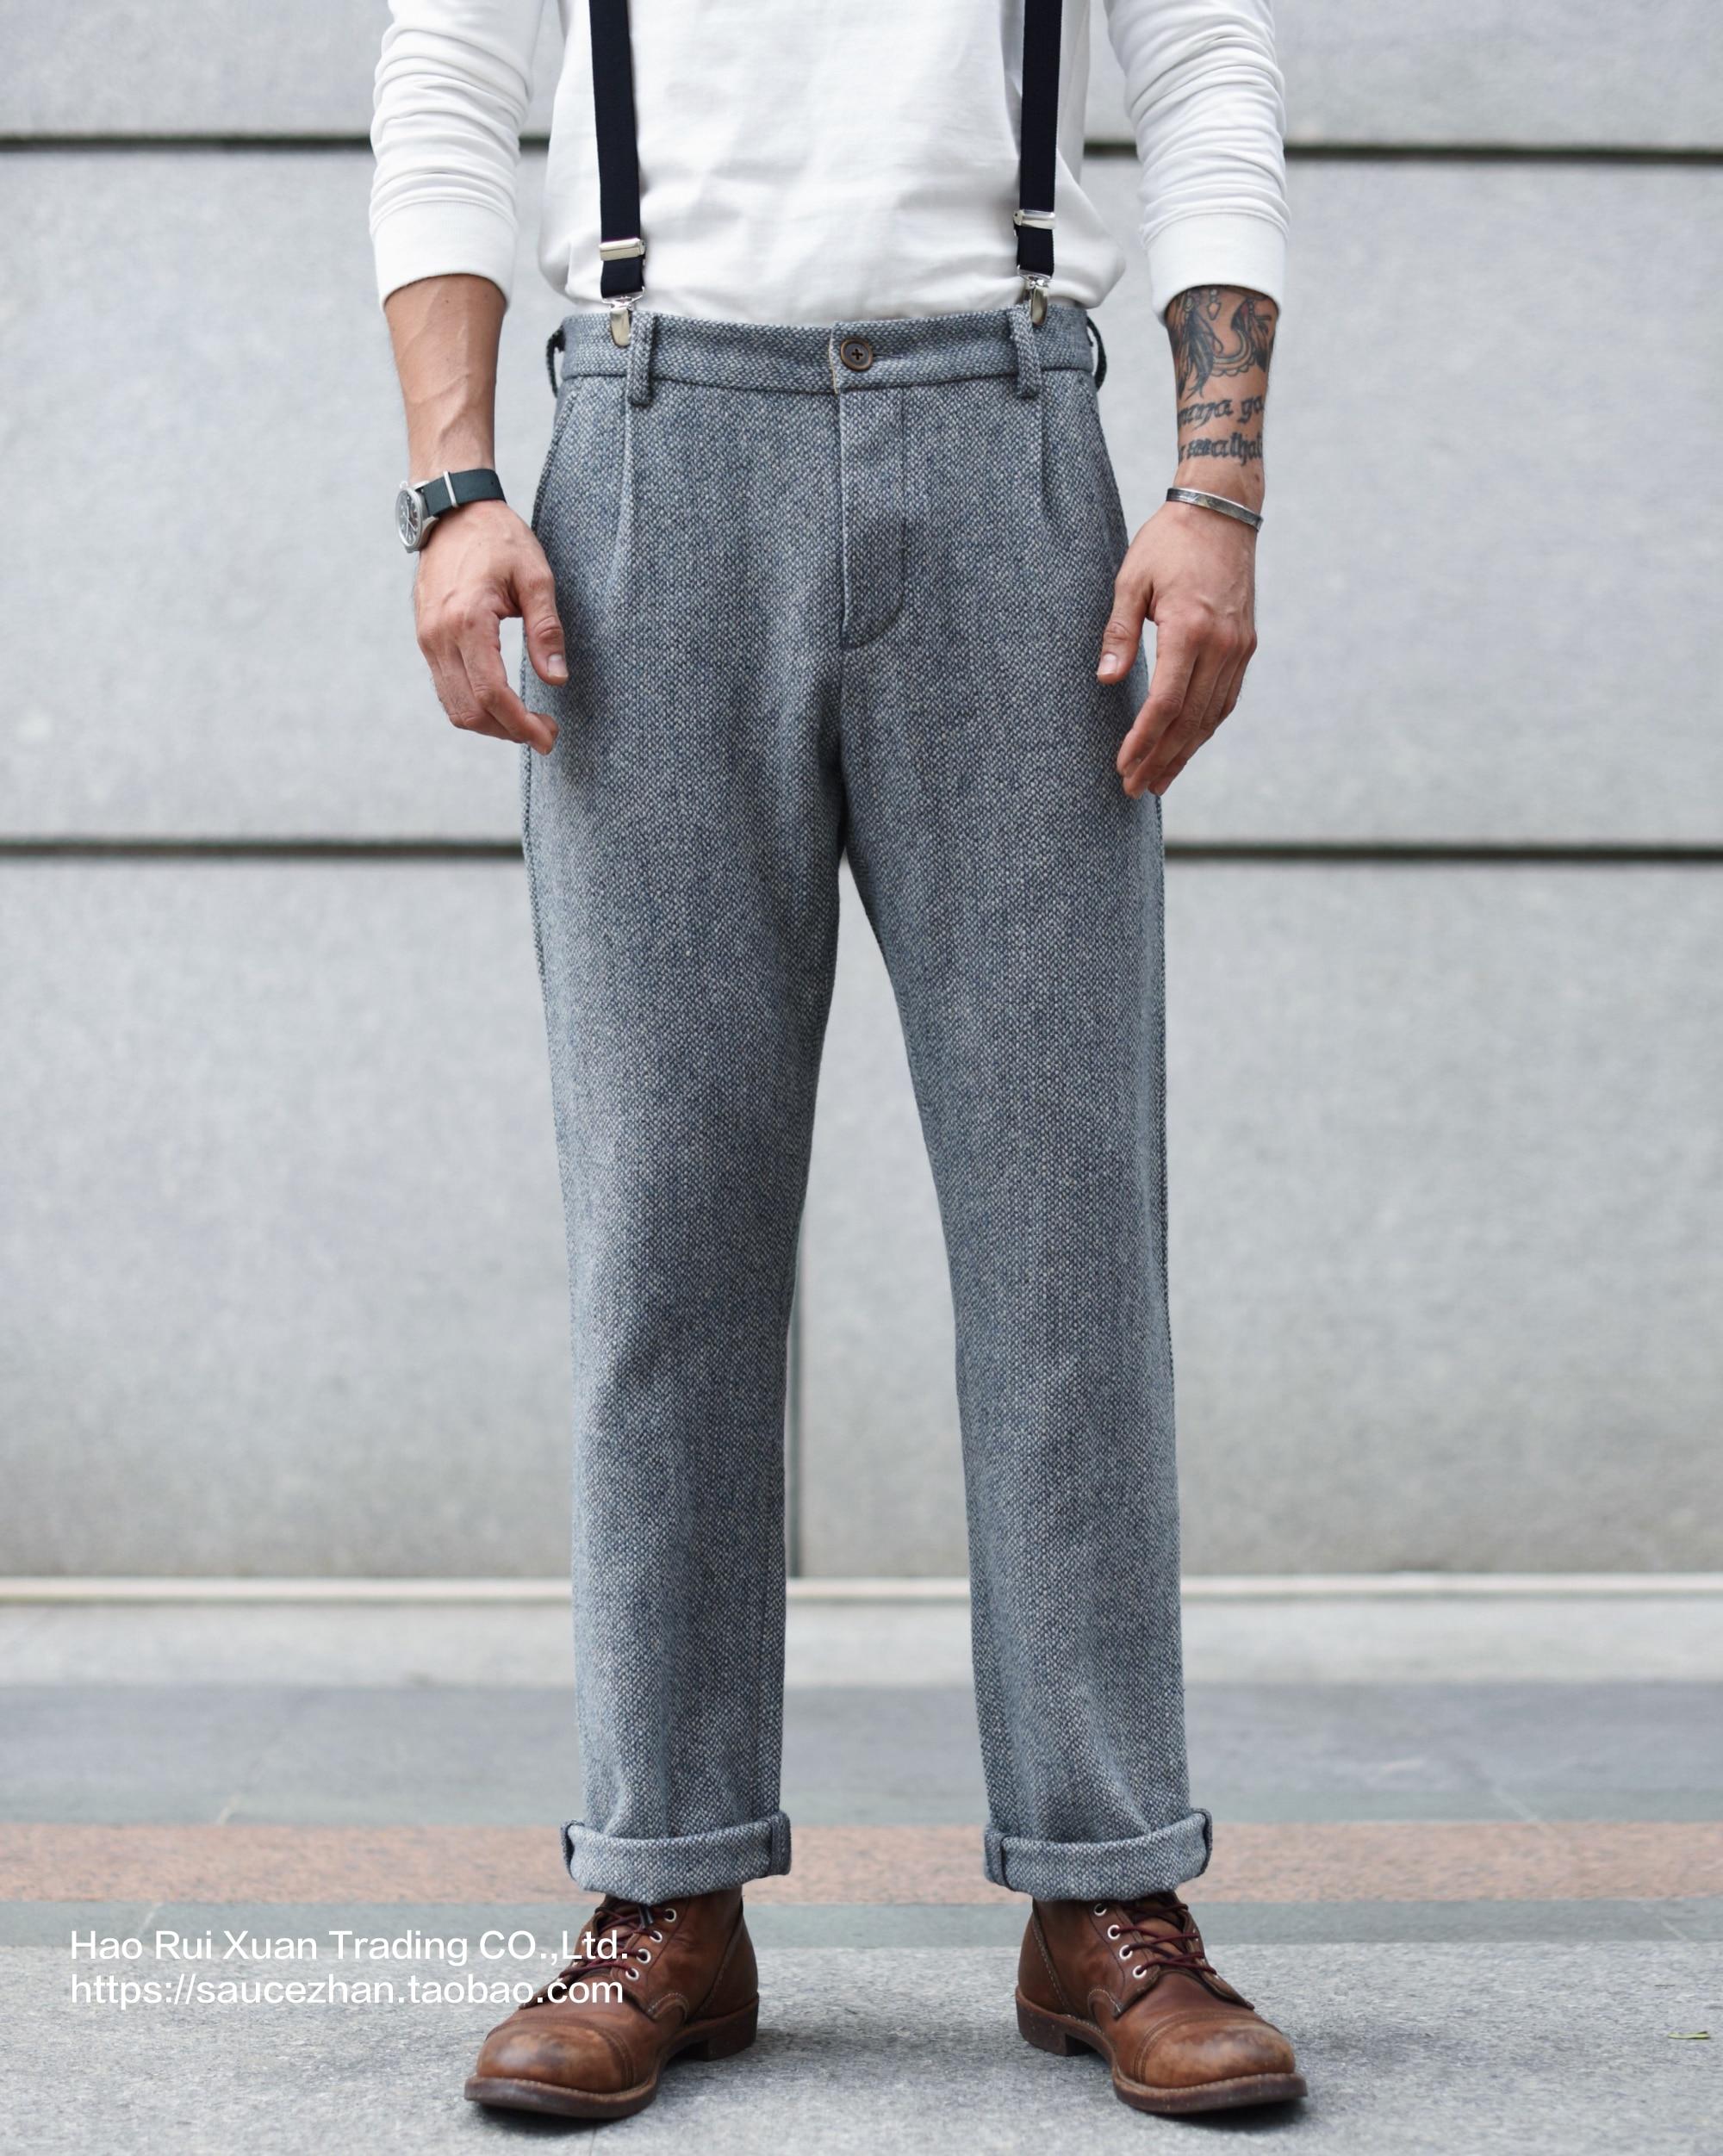 SauceZhan Wool Pants Woolen Trousers